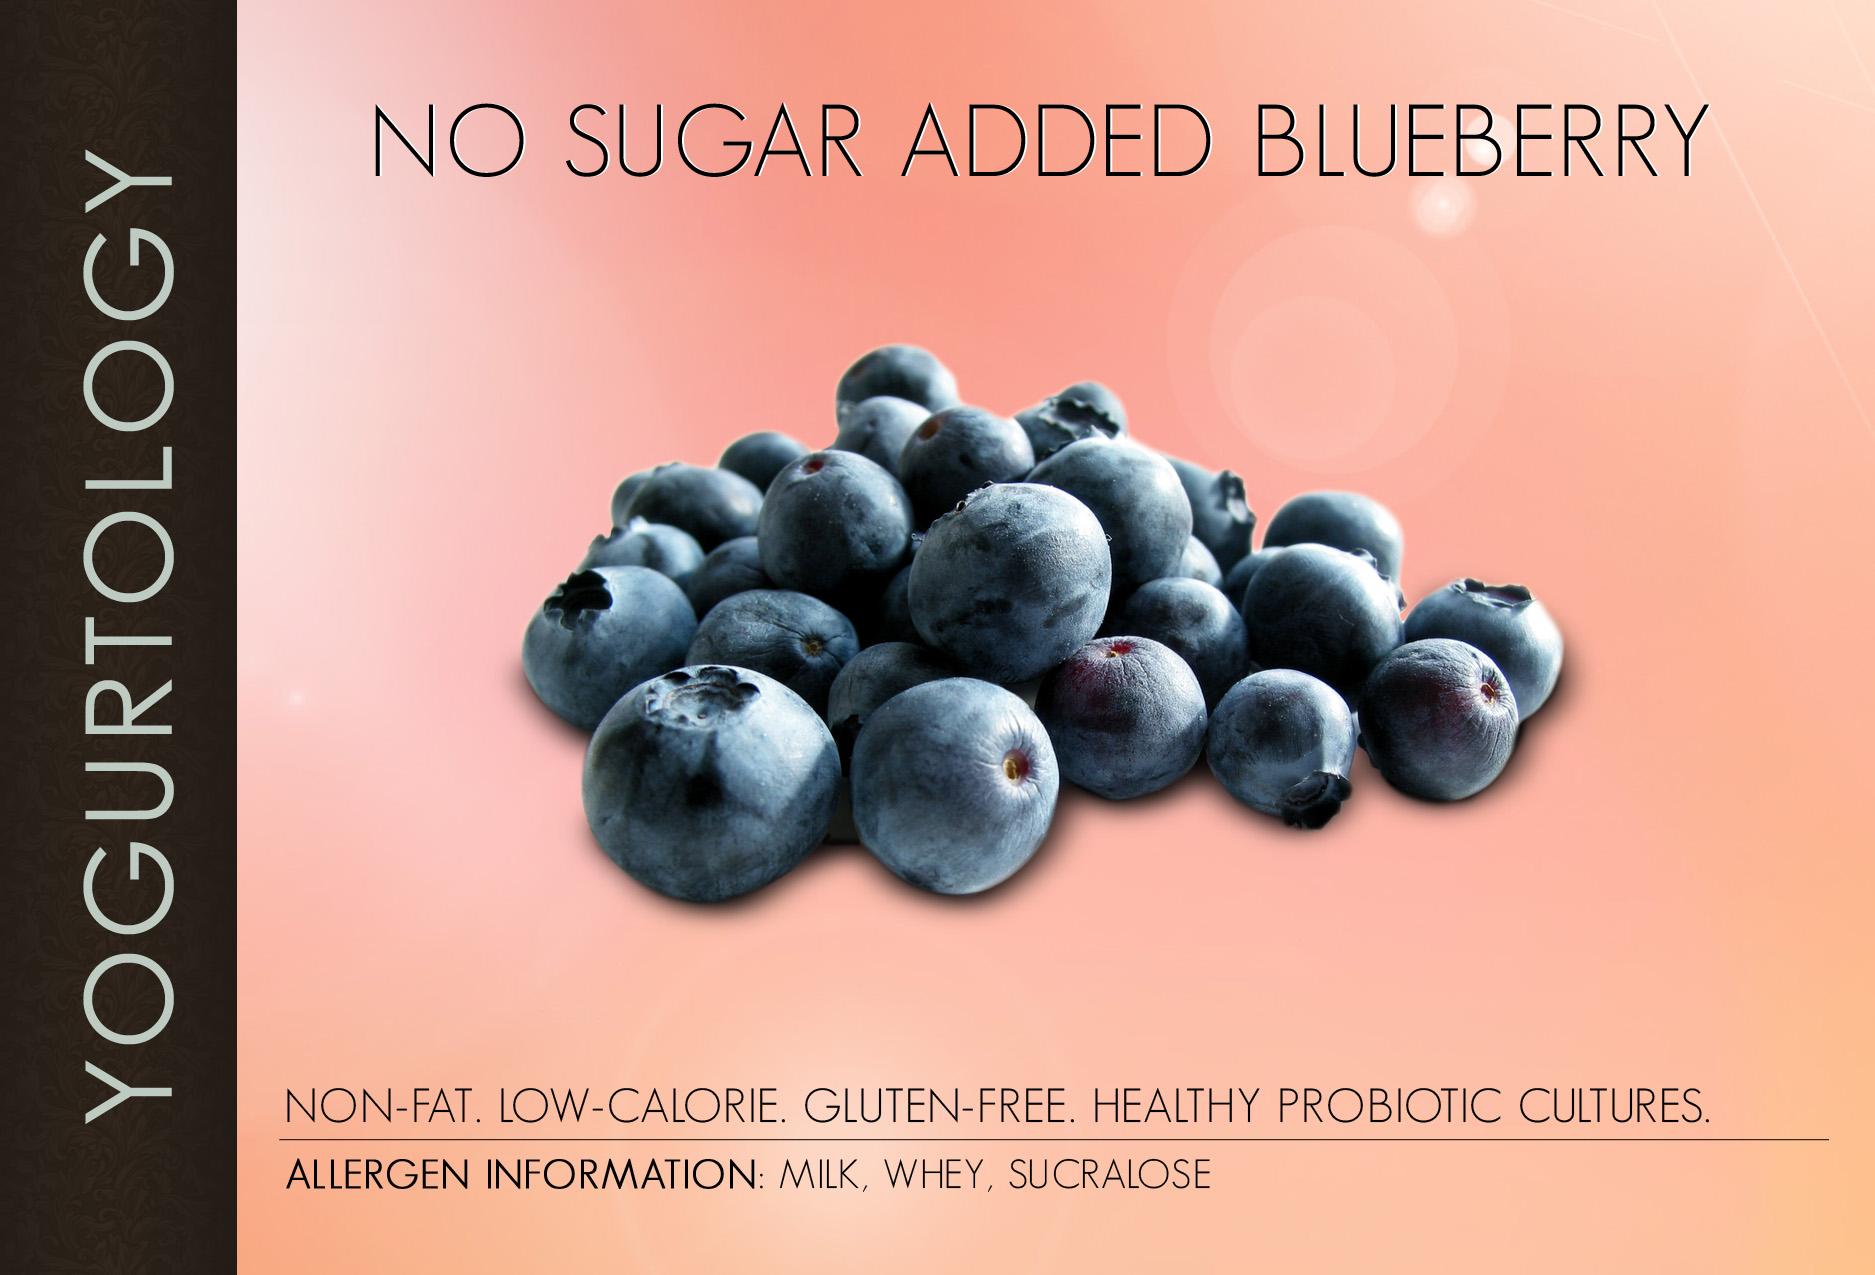 NSA Blueberry